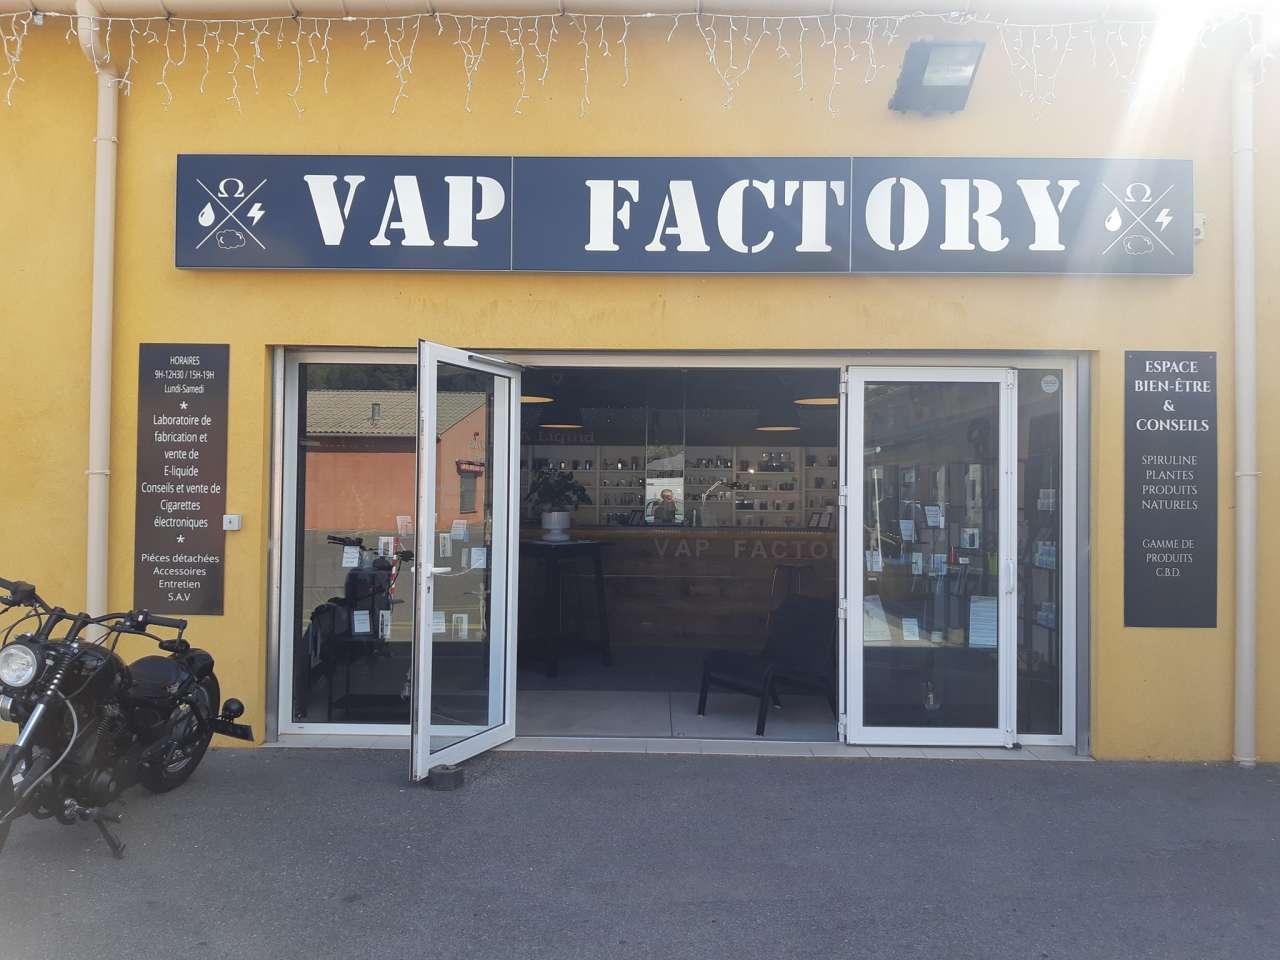 Image VAP FACTORY